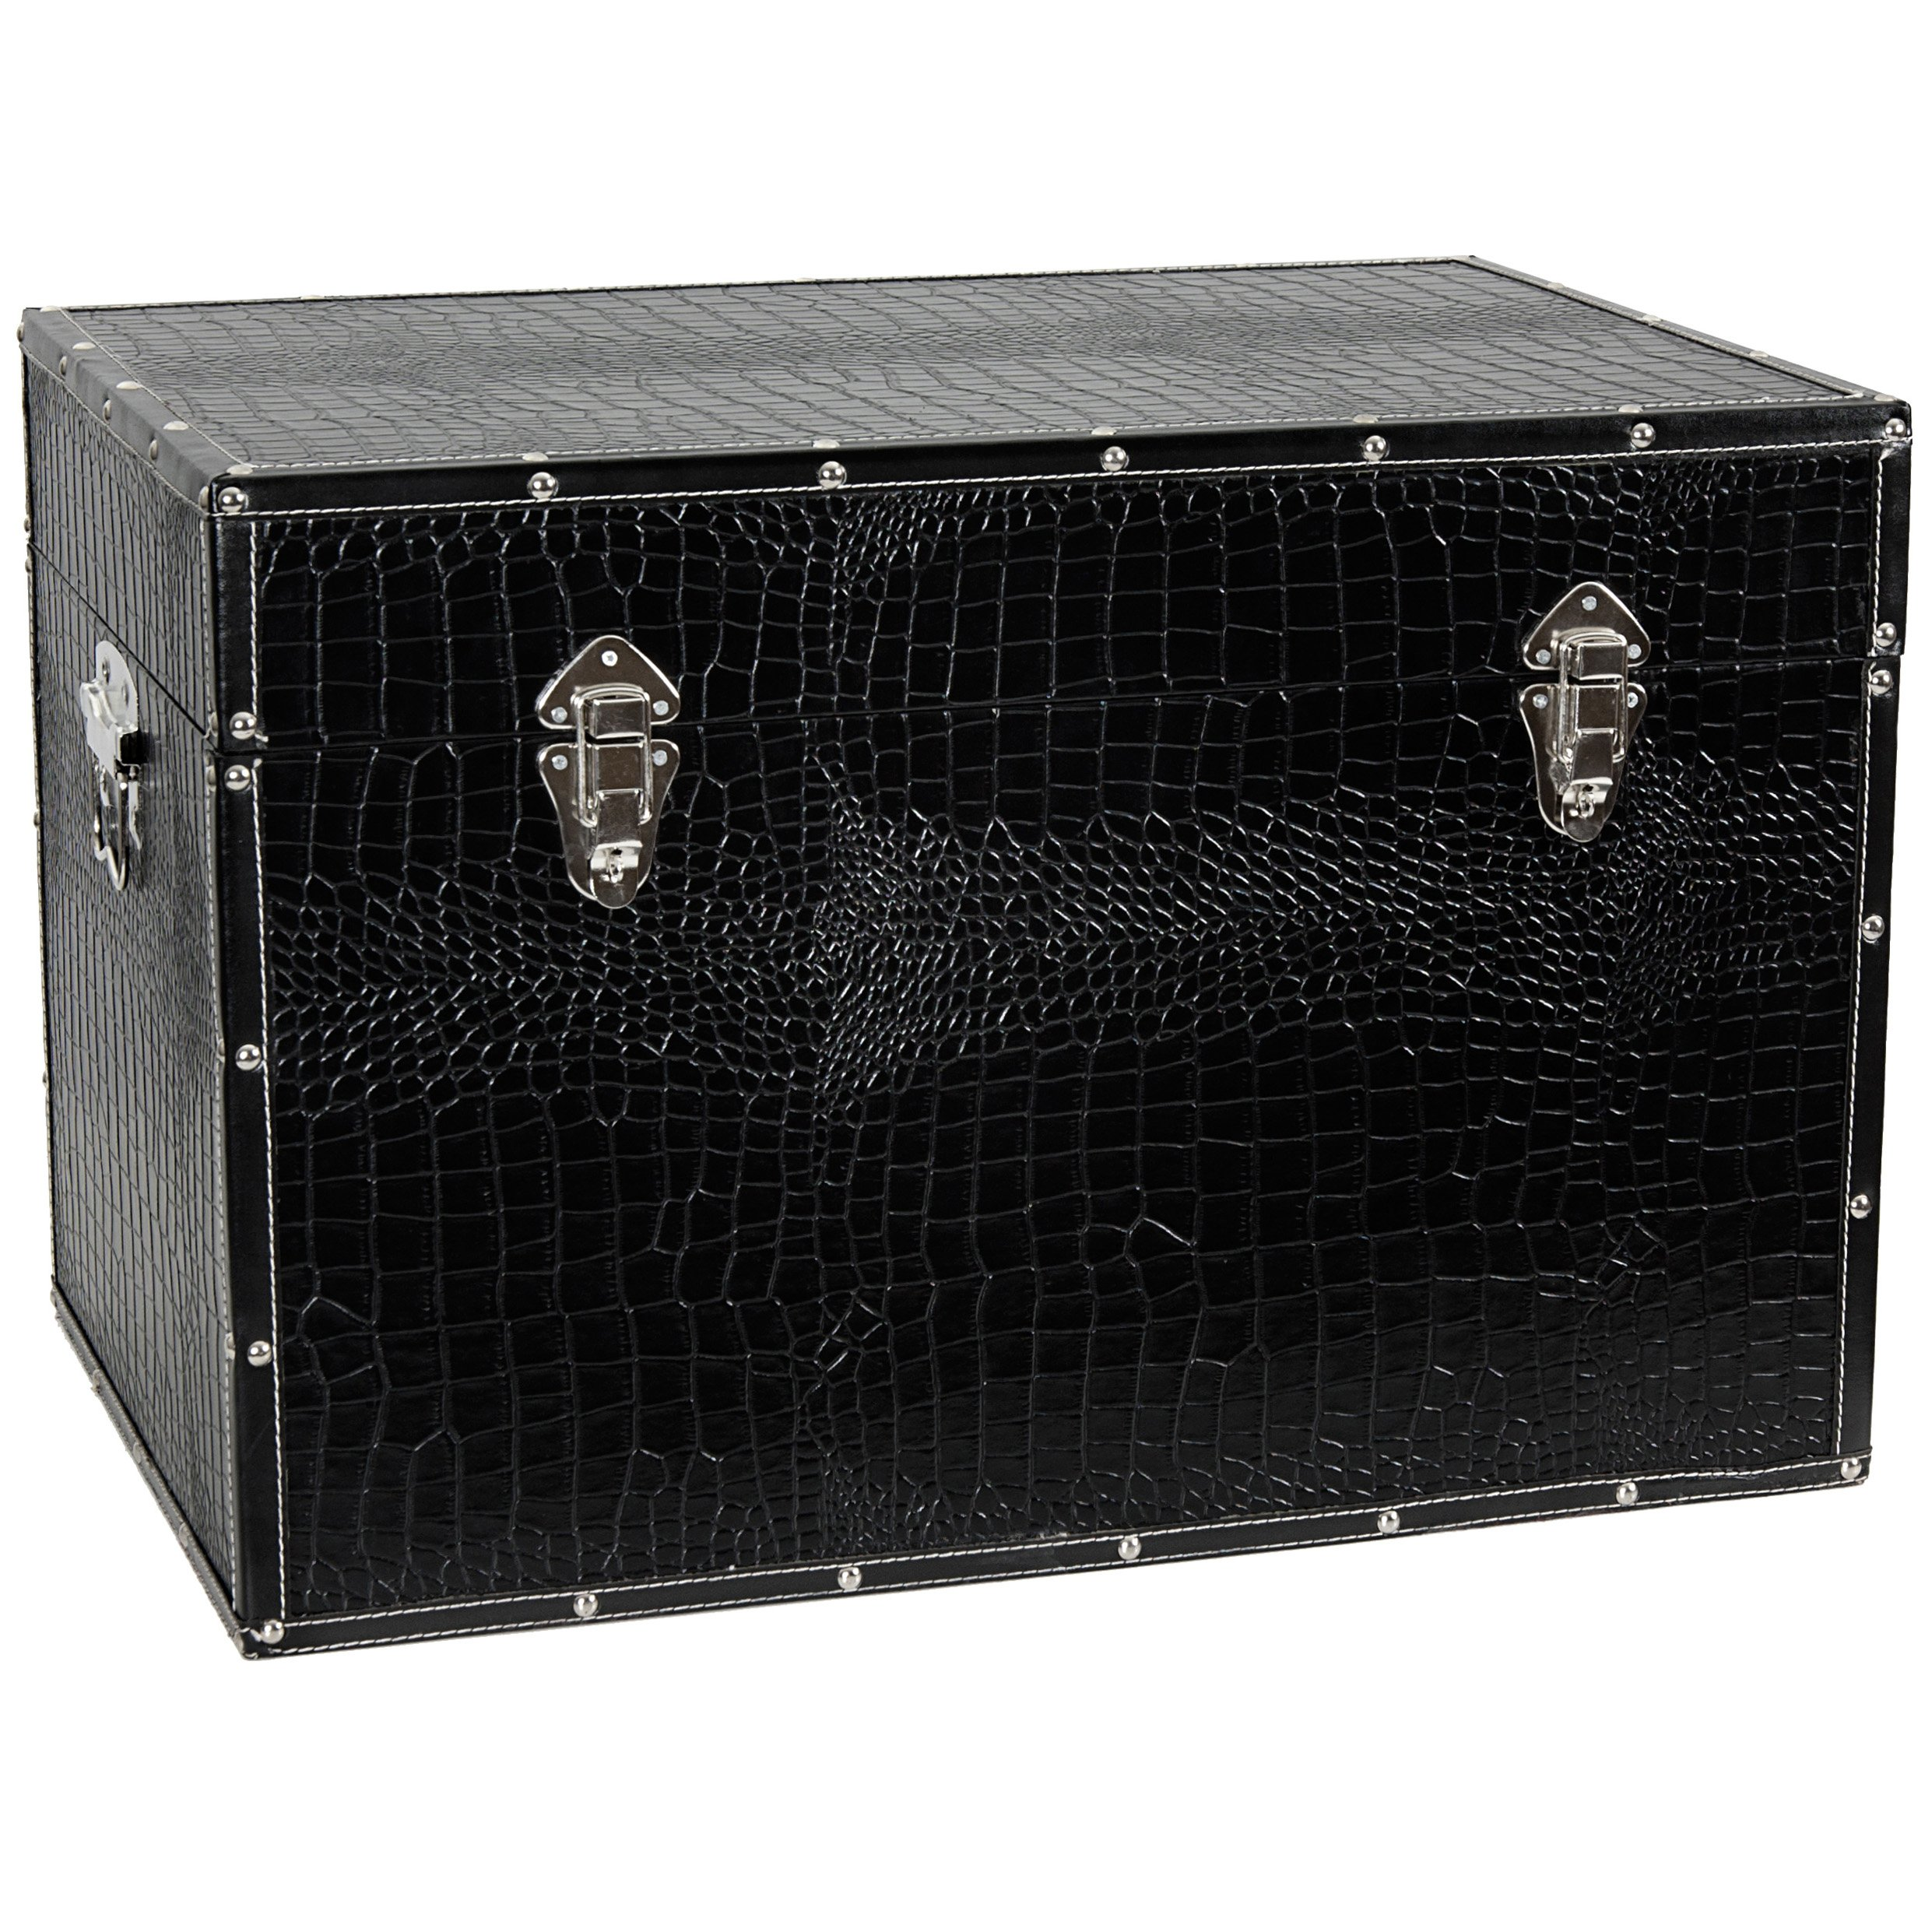 Oriental Furniture Faux Leather Black Trunk